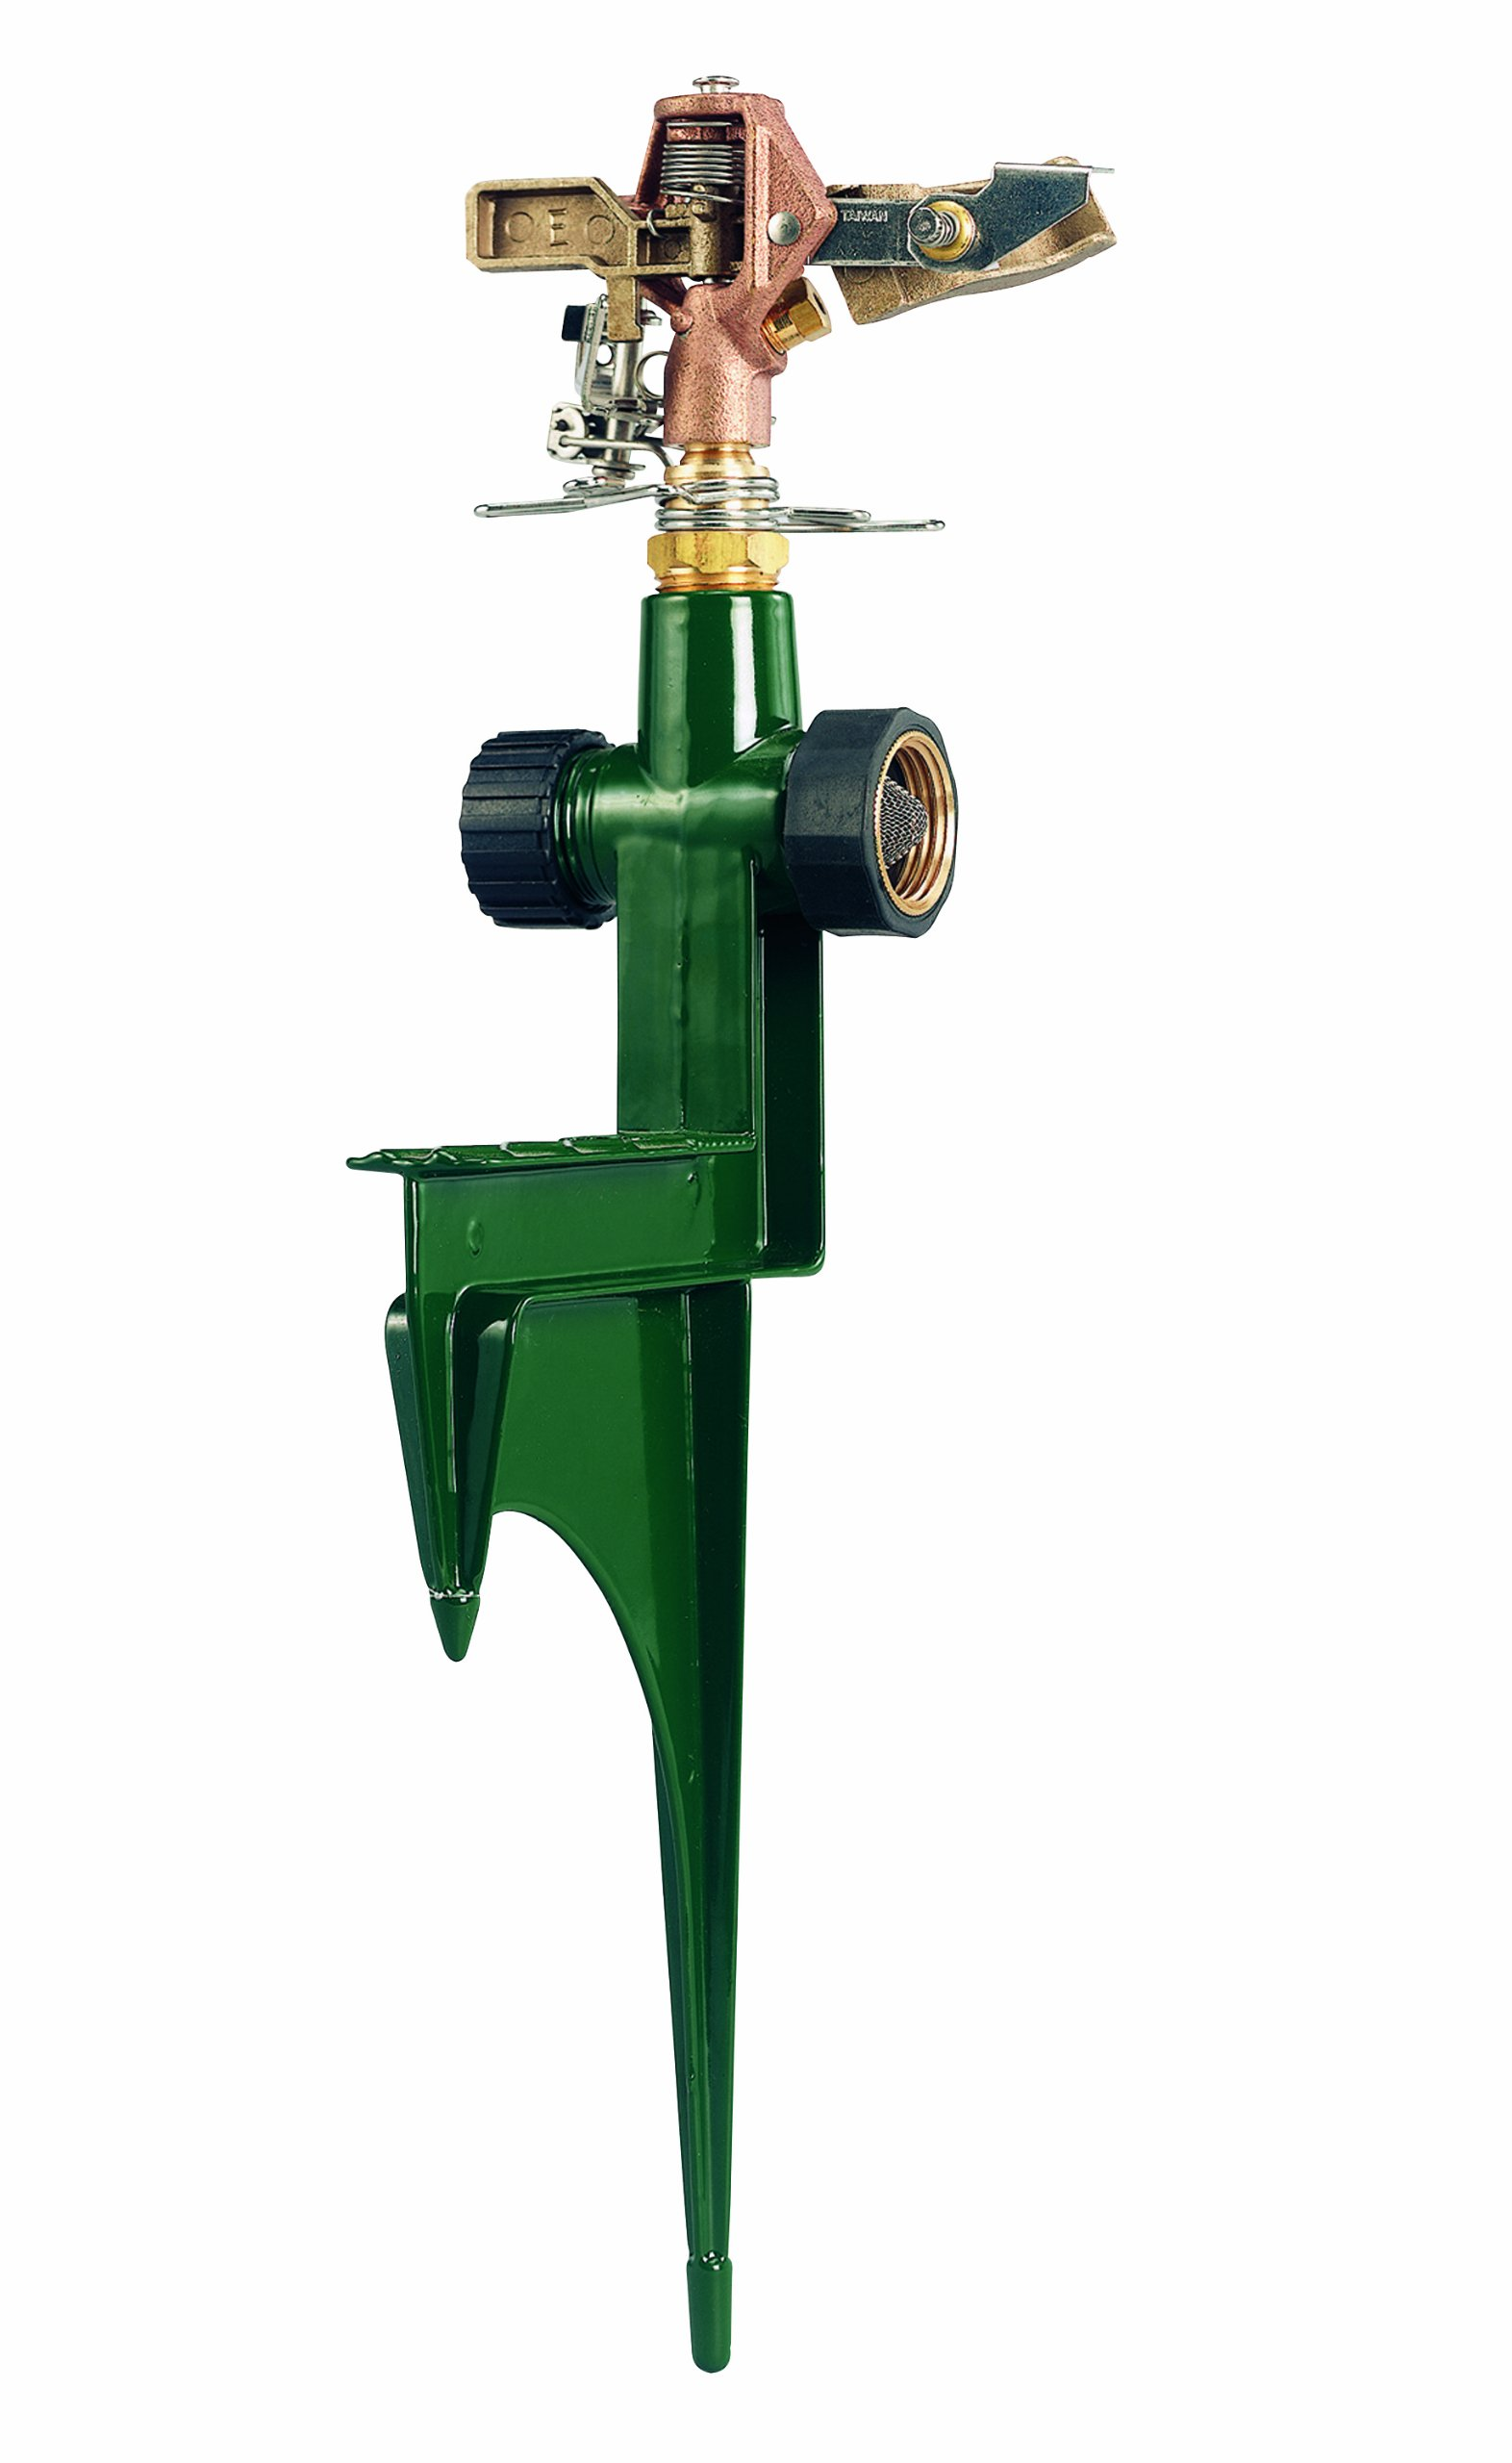 Orbit 58214N Brass Impact Sprinkler on Heavy-Duty Step Spike